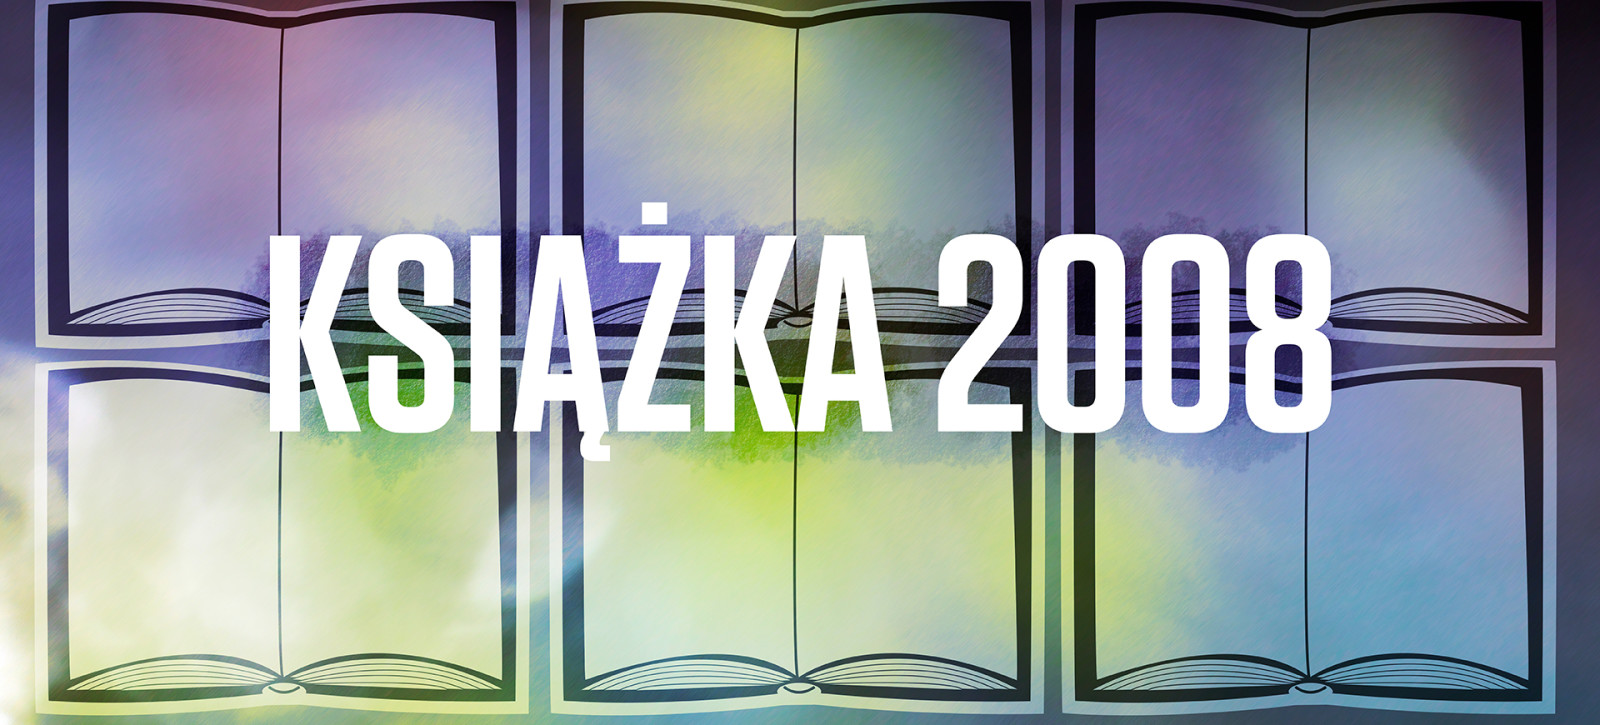 35_Książka_2008_grafika_debaty